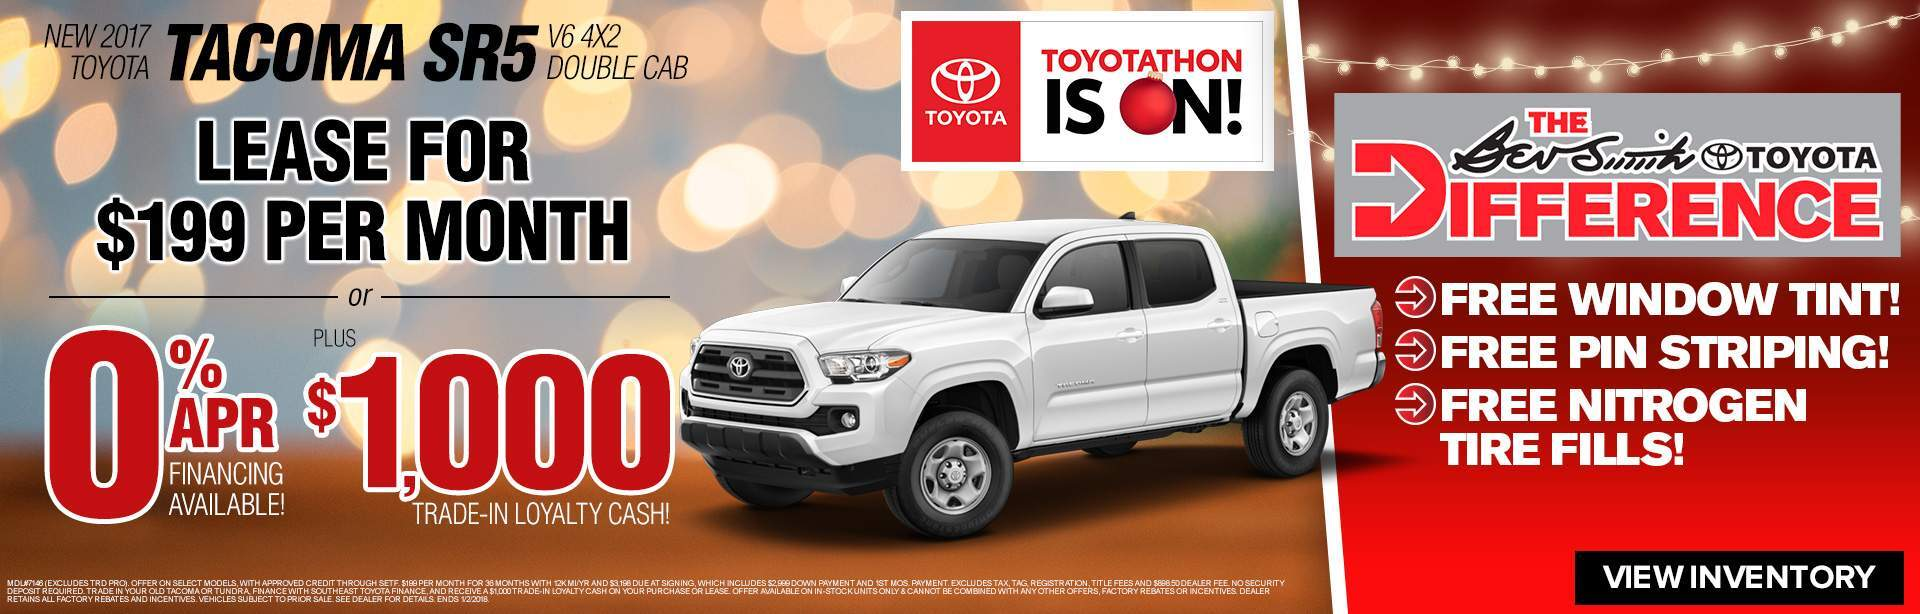 Used Cars Tacoma >> Toyota Dealership Fort Pierce Fl Used Cars Bev Smith Toyota